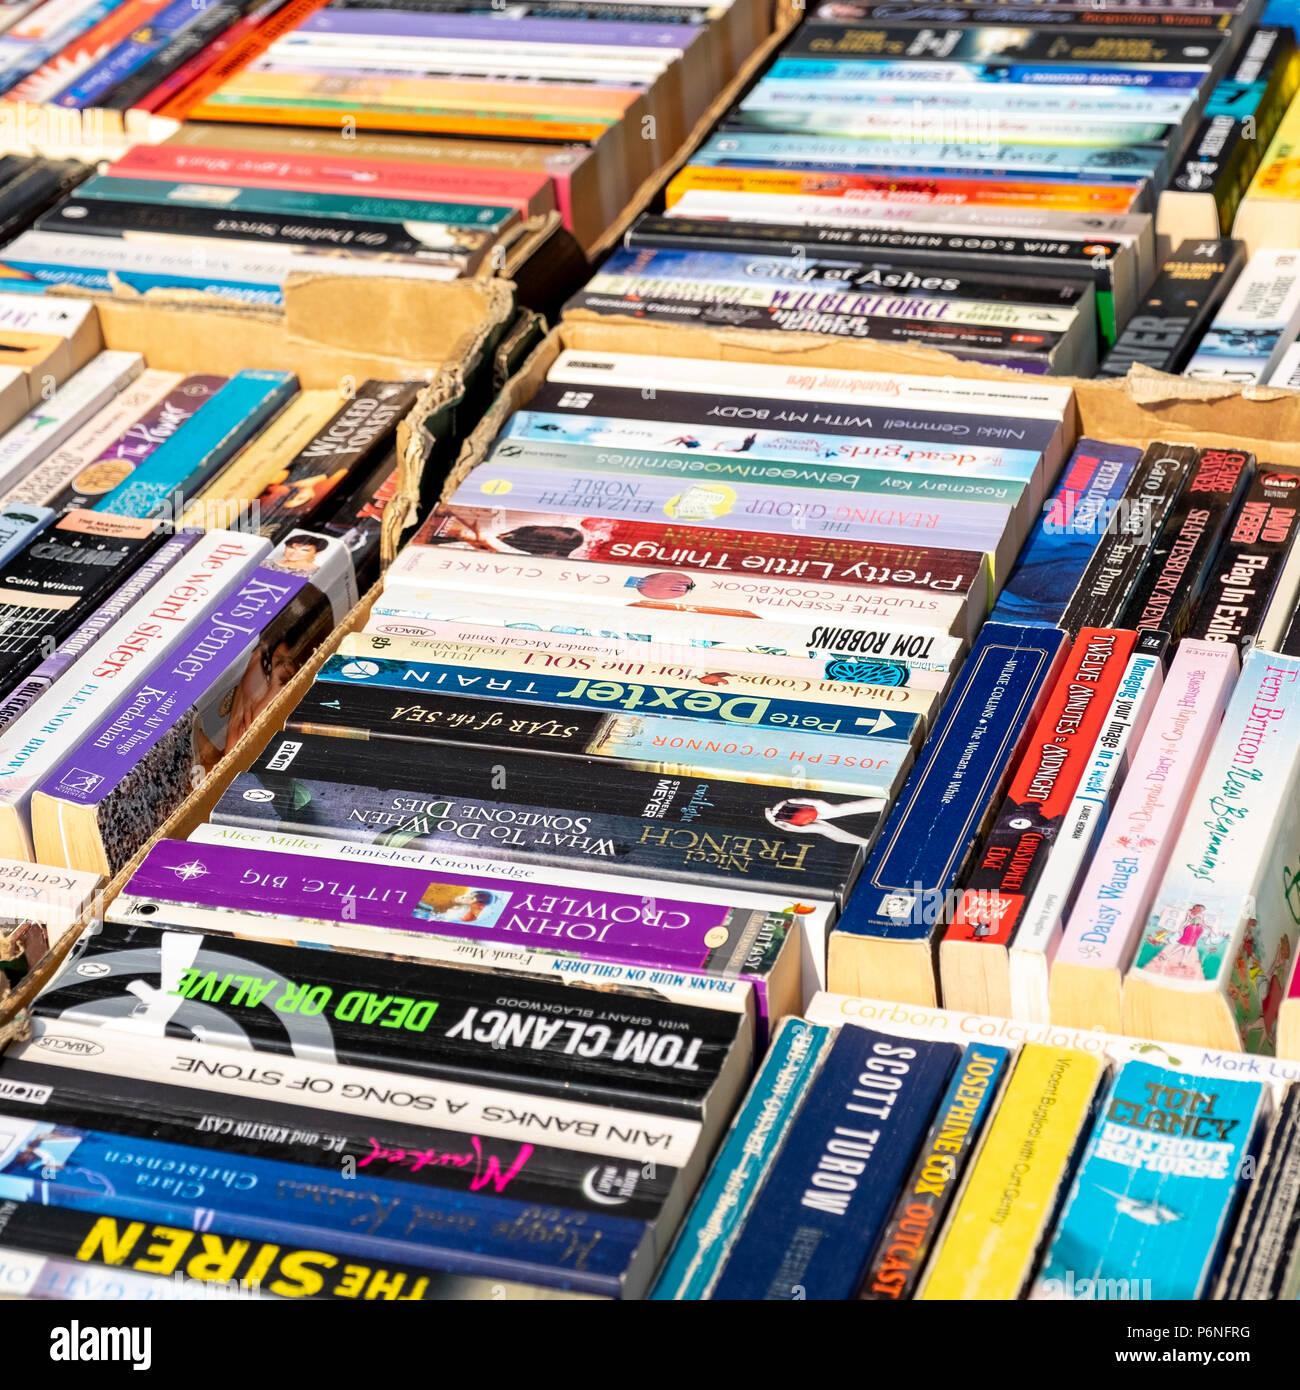 Paperback books - Stock Image